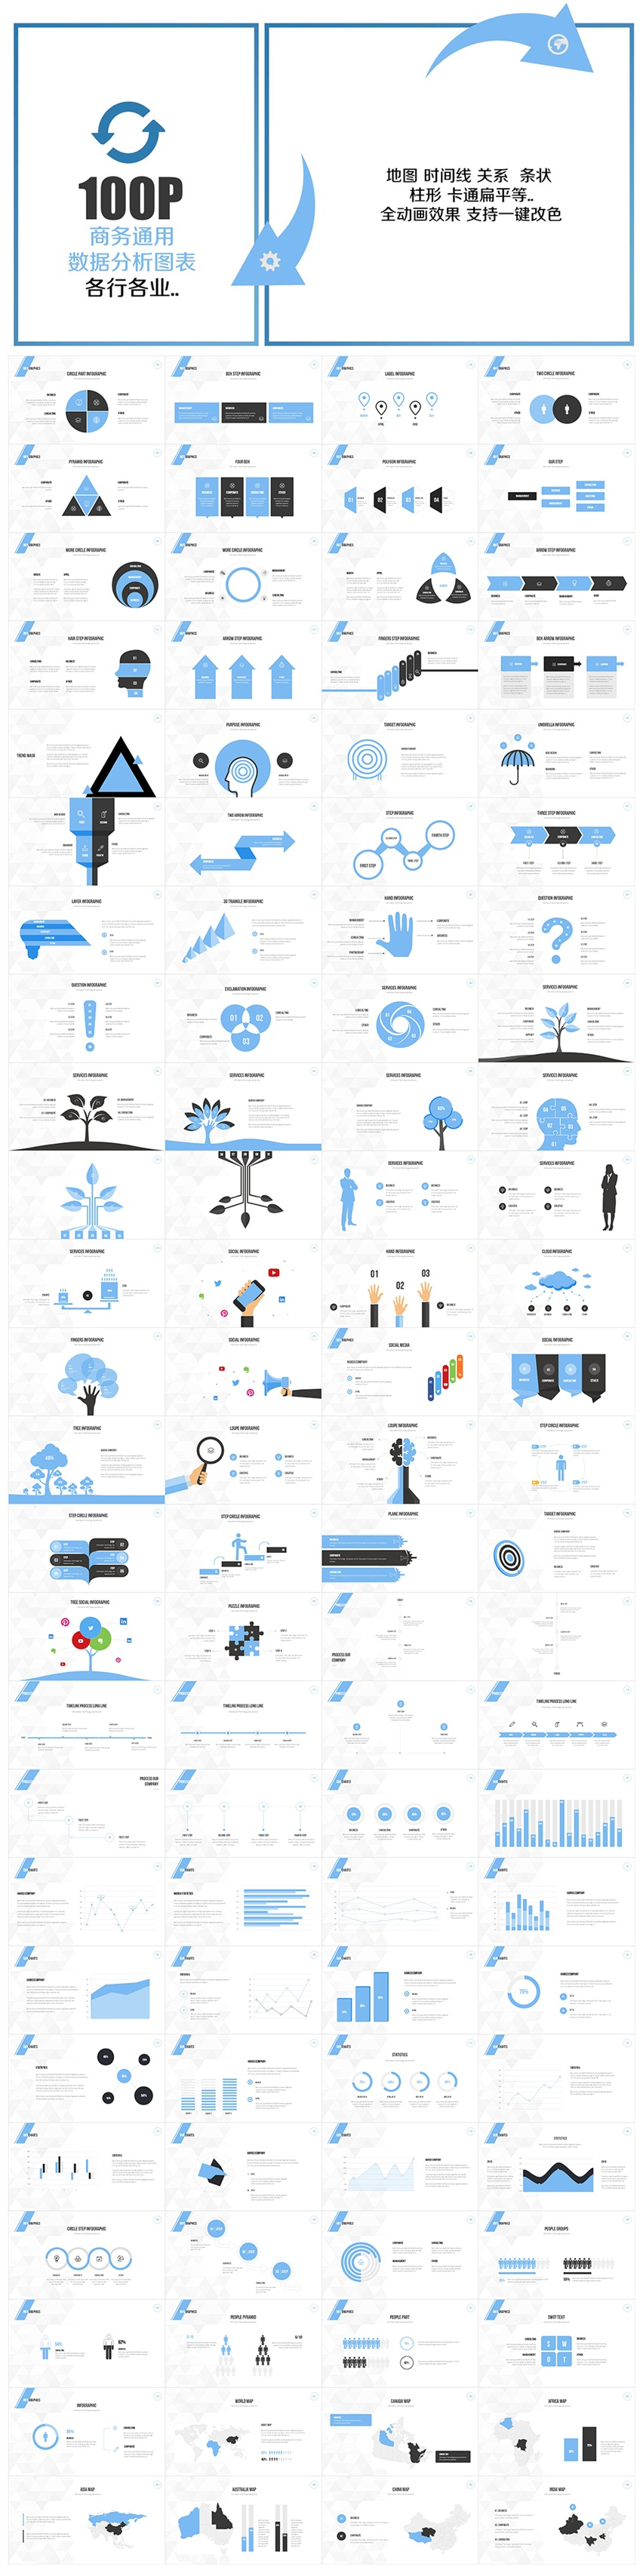 ppt图表 黑金大气商务ppt模板 蓝色商务信息图表合集ppt  作品标签